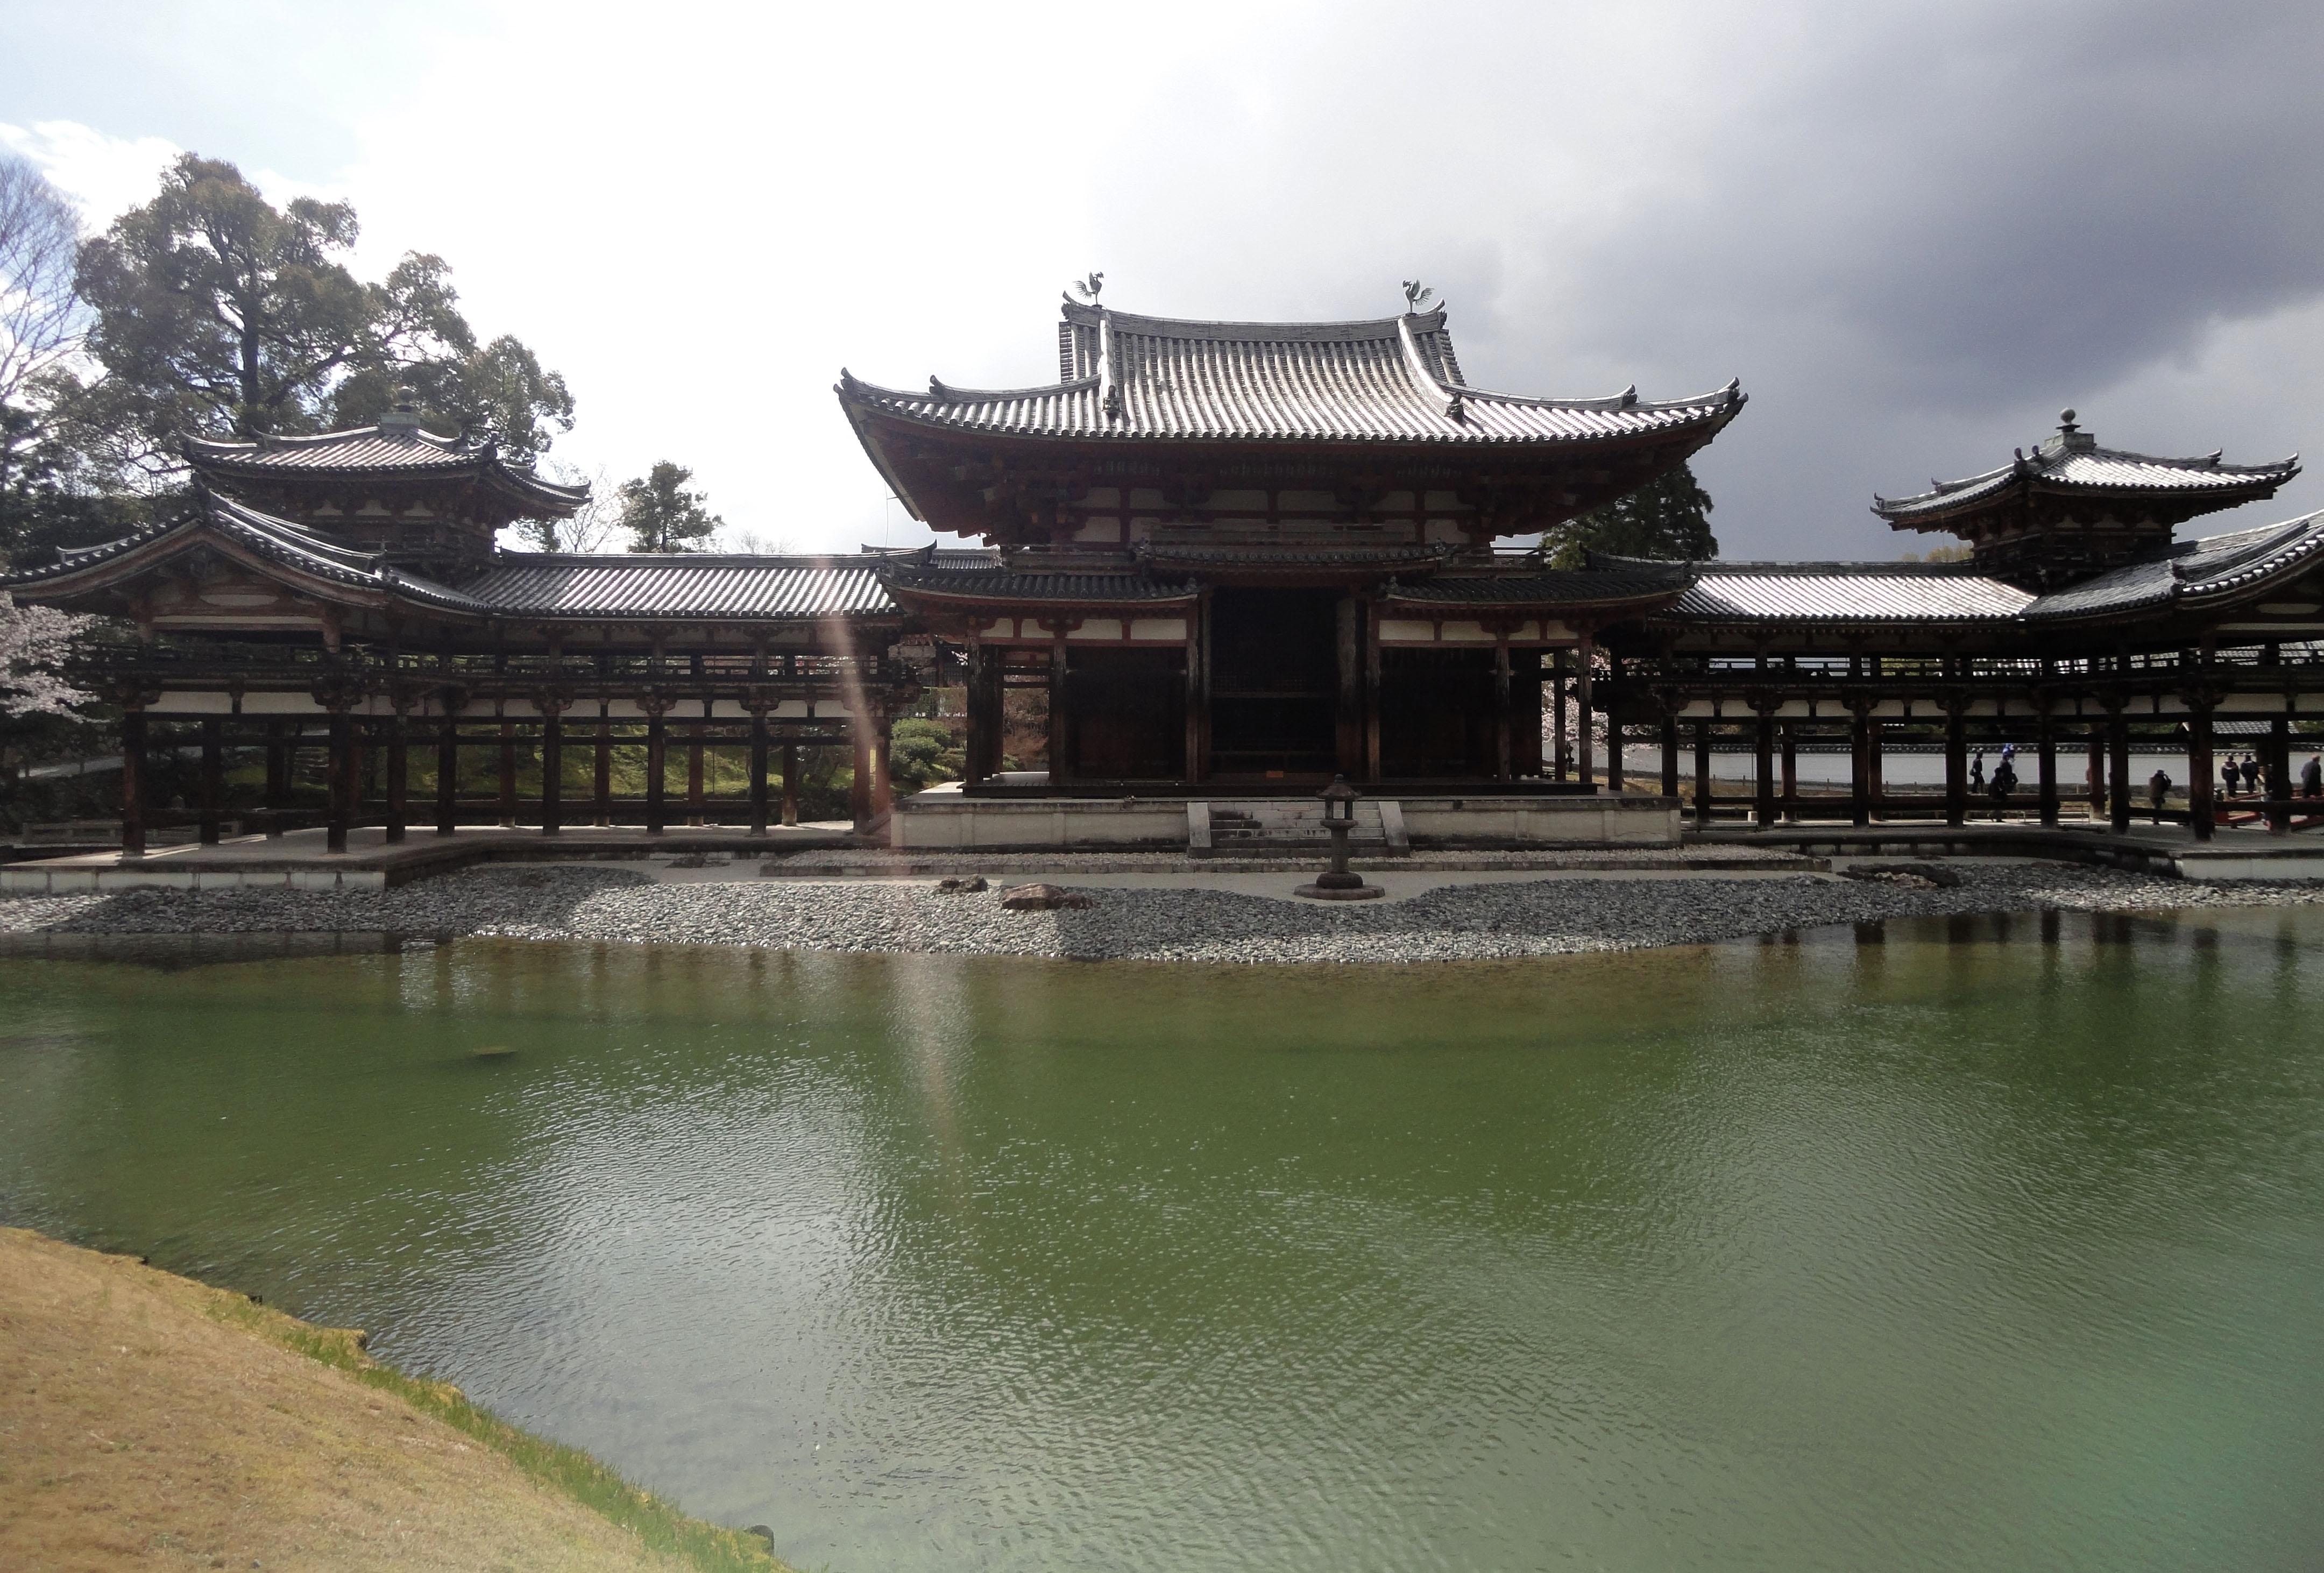 Byodo in temple Phoenix Hall Jodo shiki garden pond Kyoto Japan 04